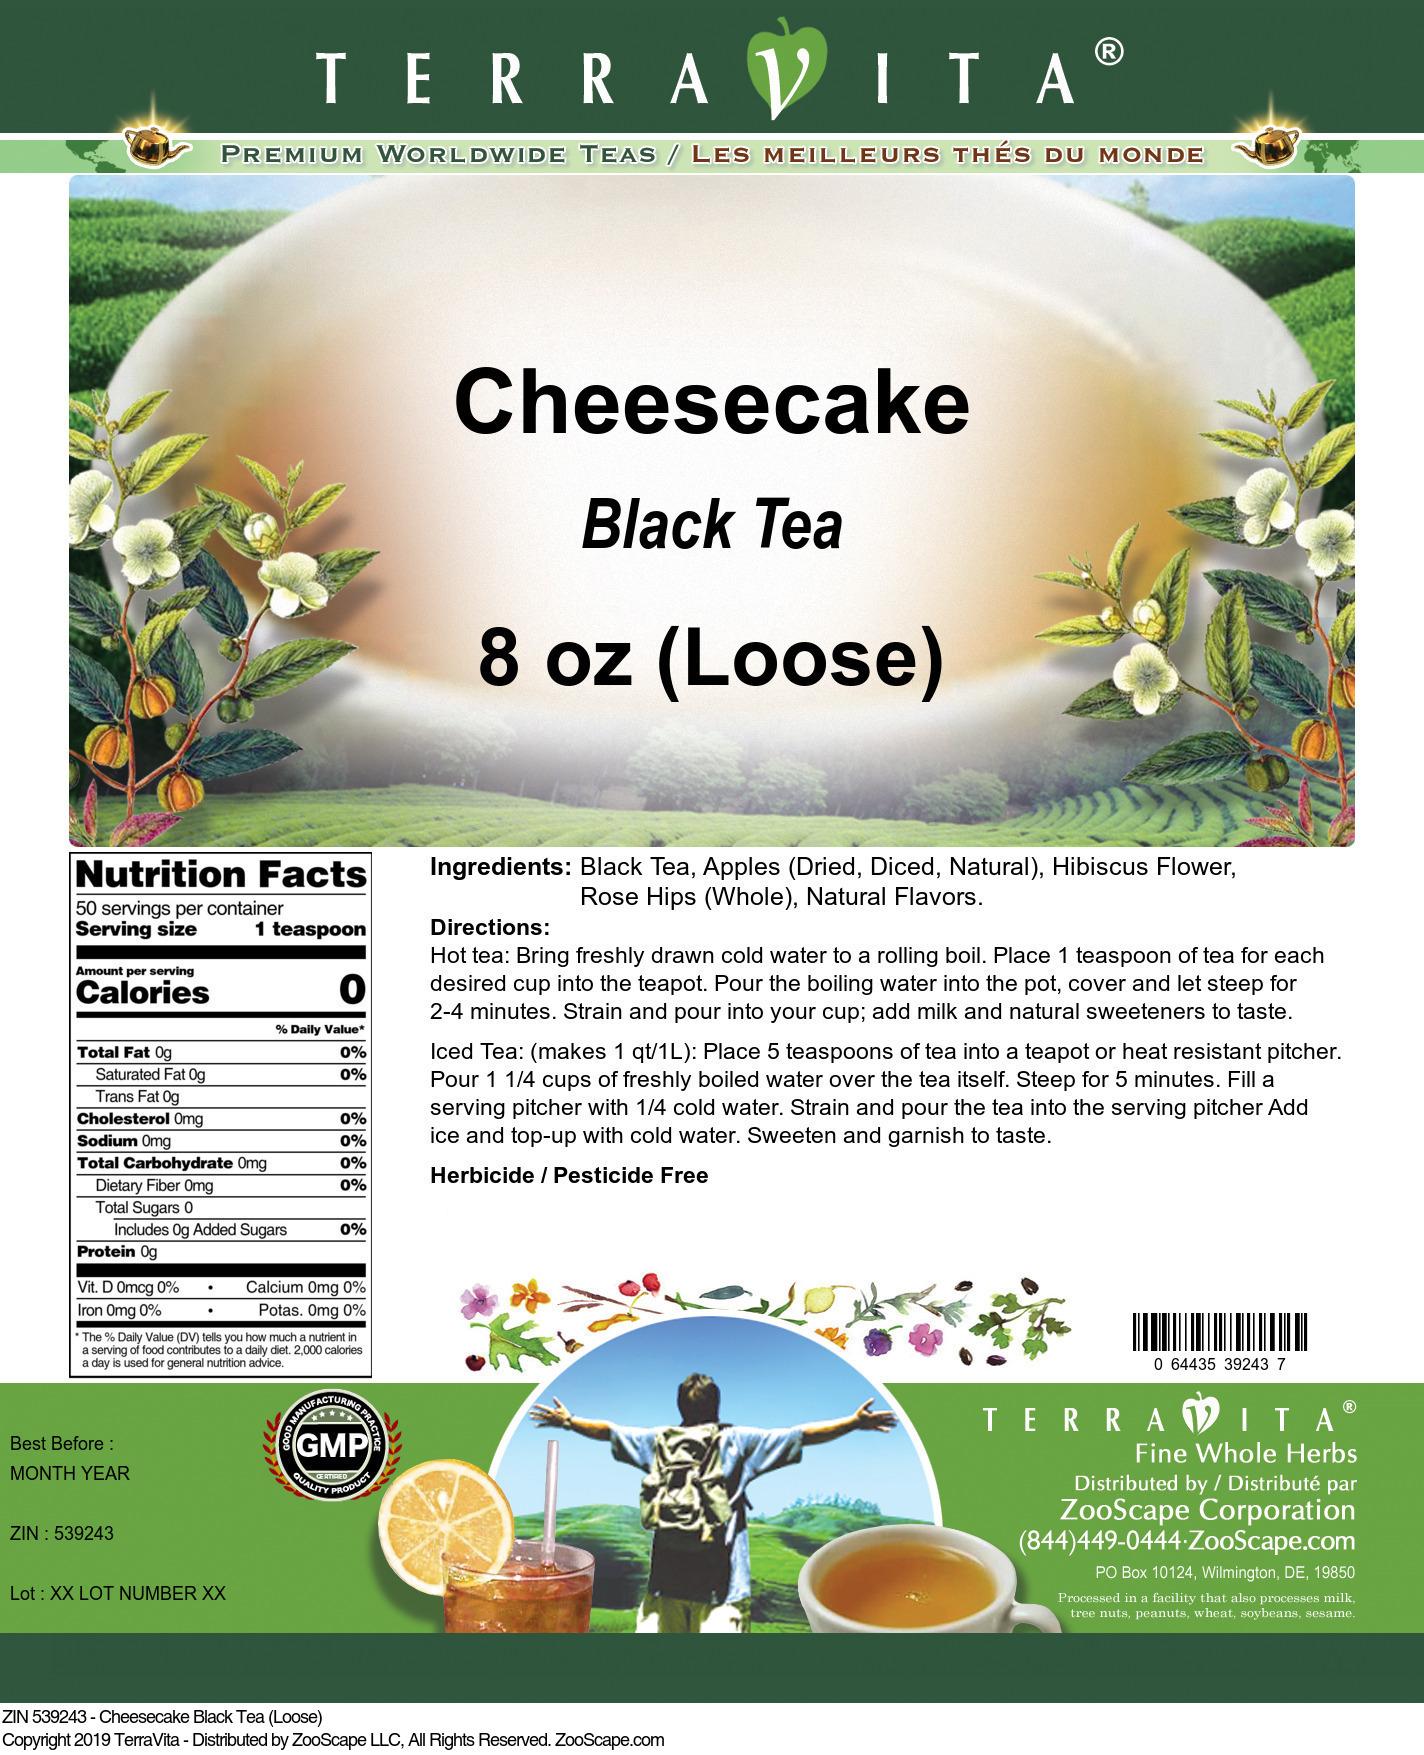 Cheesecake Black Tea